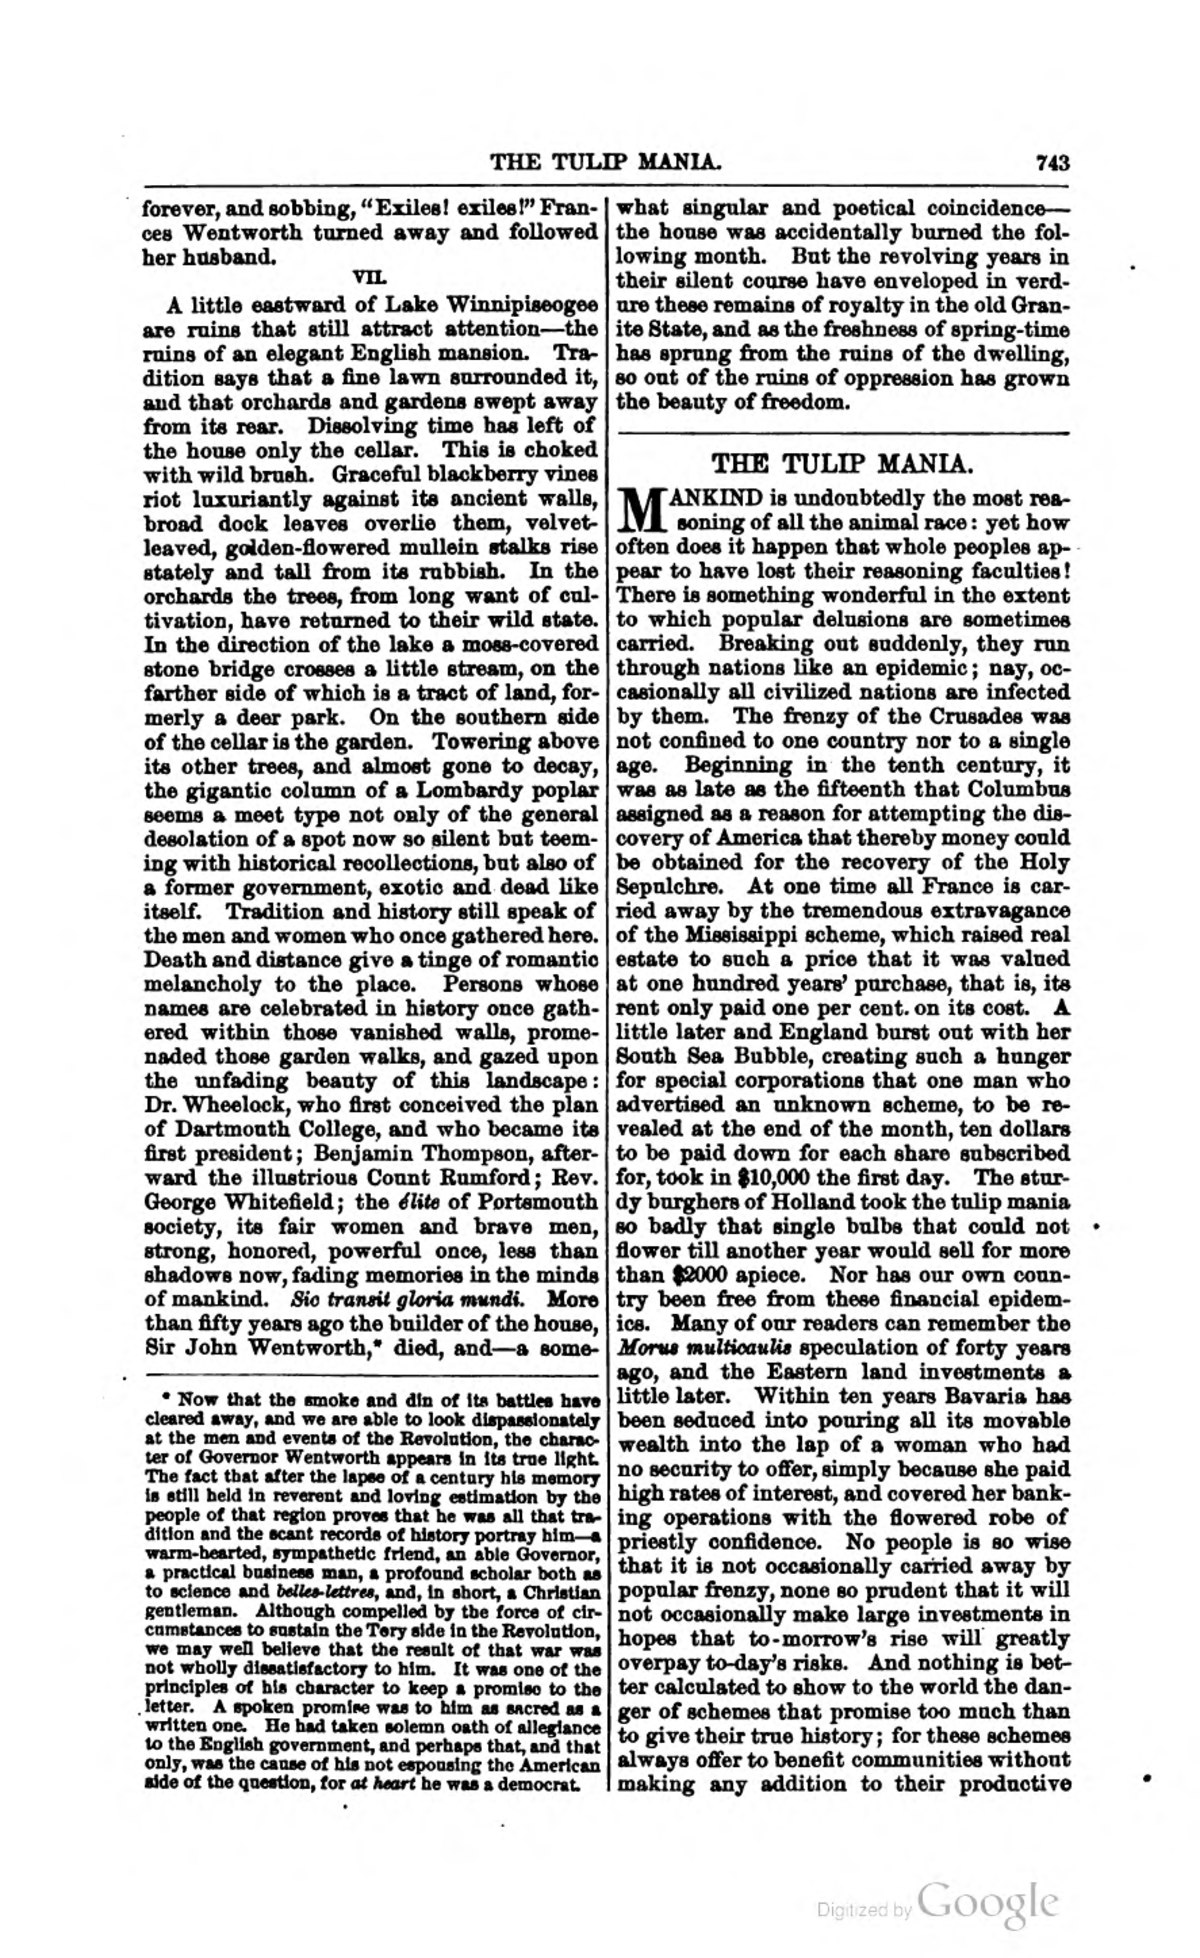 FileThe Tulip Mania.djvu   Wikipedia